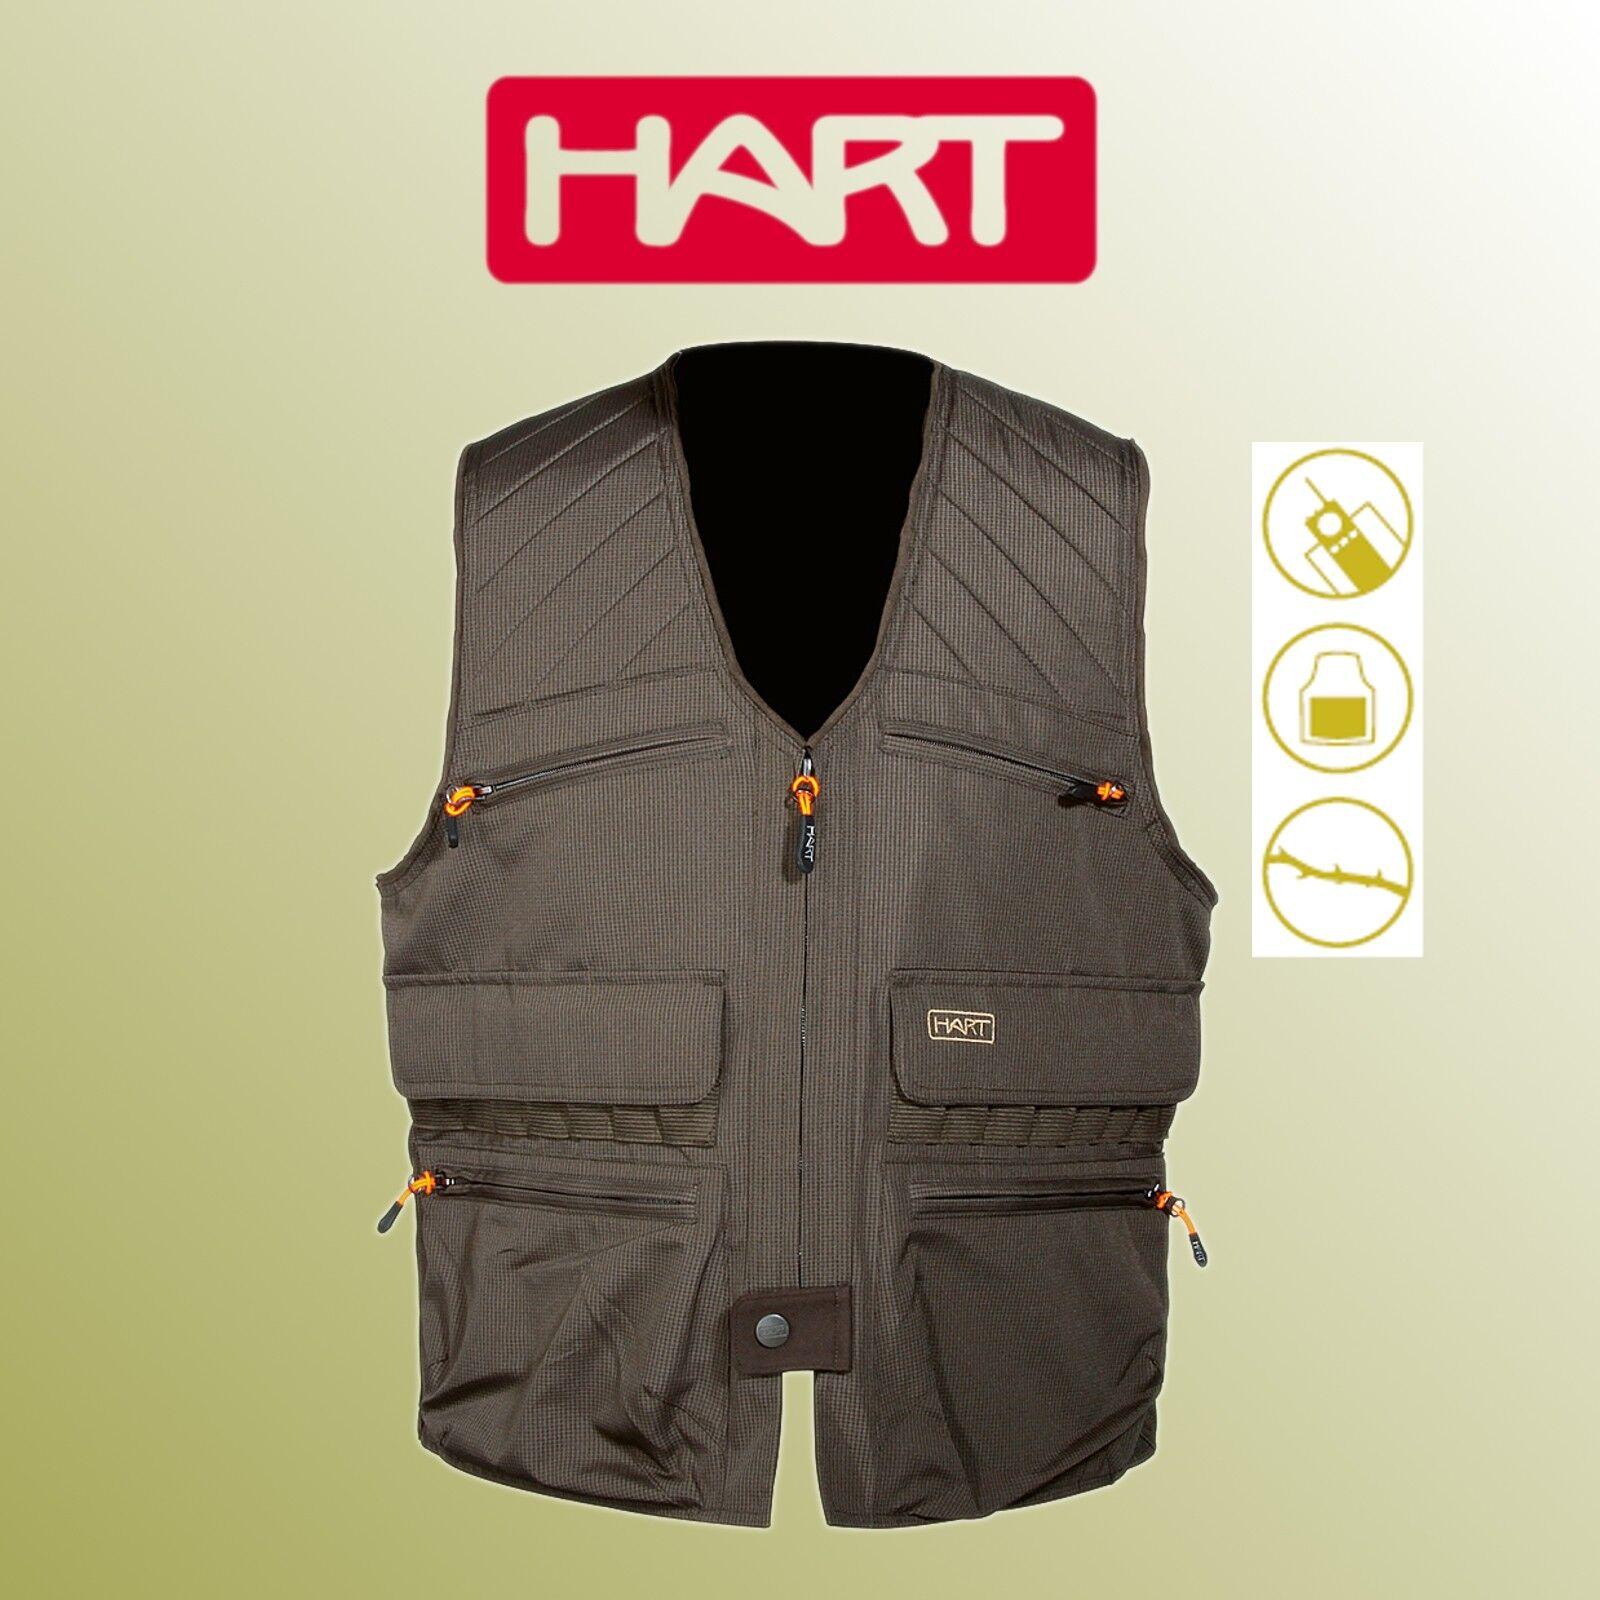 ██▓▒░ Hart Jagdweste doppelter Hasentasche 2 Aufnahmereihen Aufnahmereihen Aufnahmereihen Gr L  XL  XXL 36e7b0